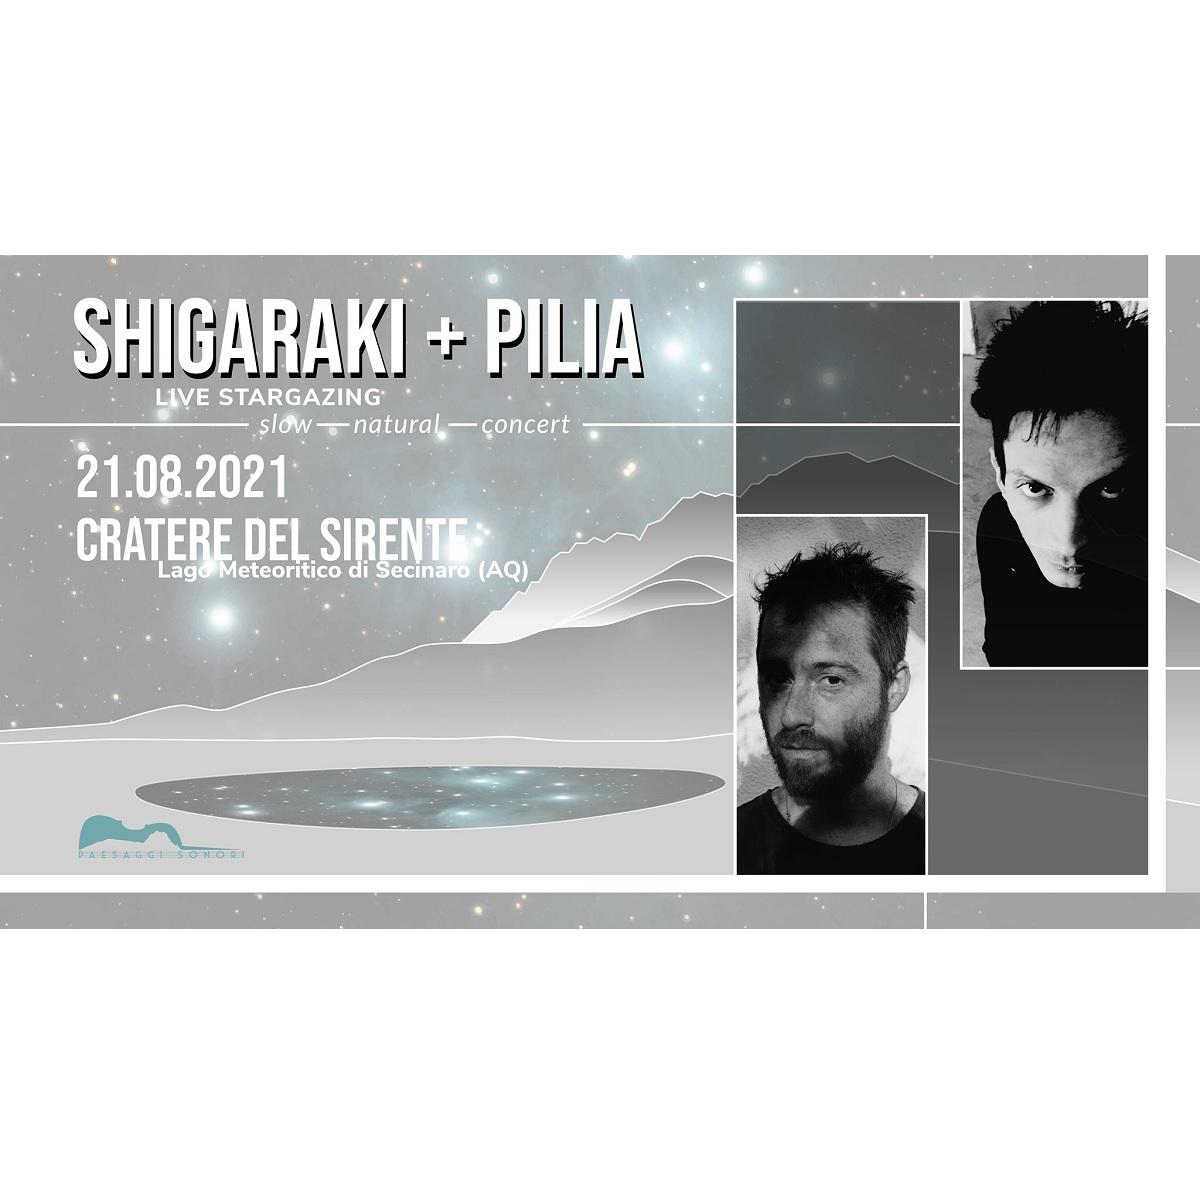 Shigaraki + Pilia live sabato 21 agosto 2021 foto